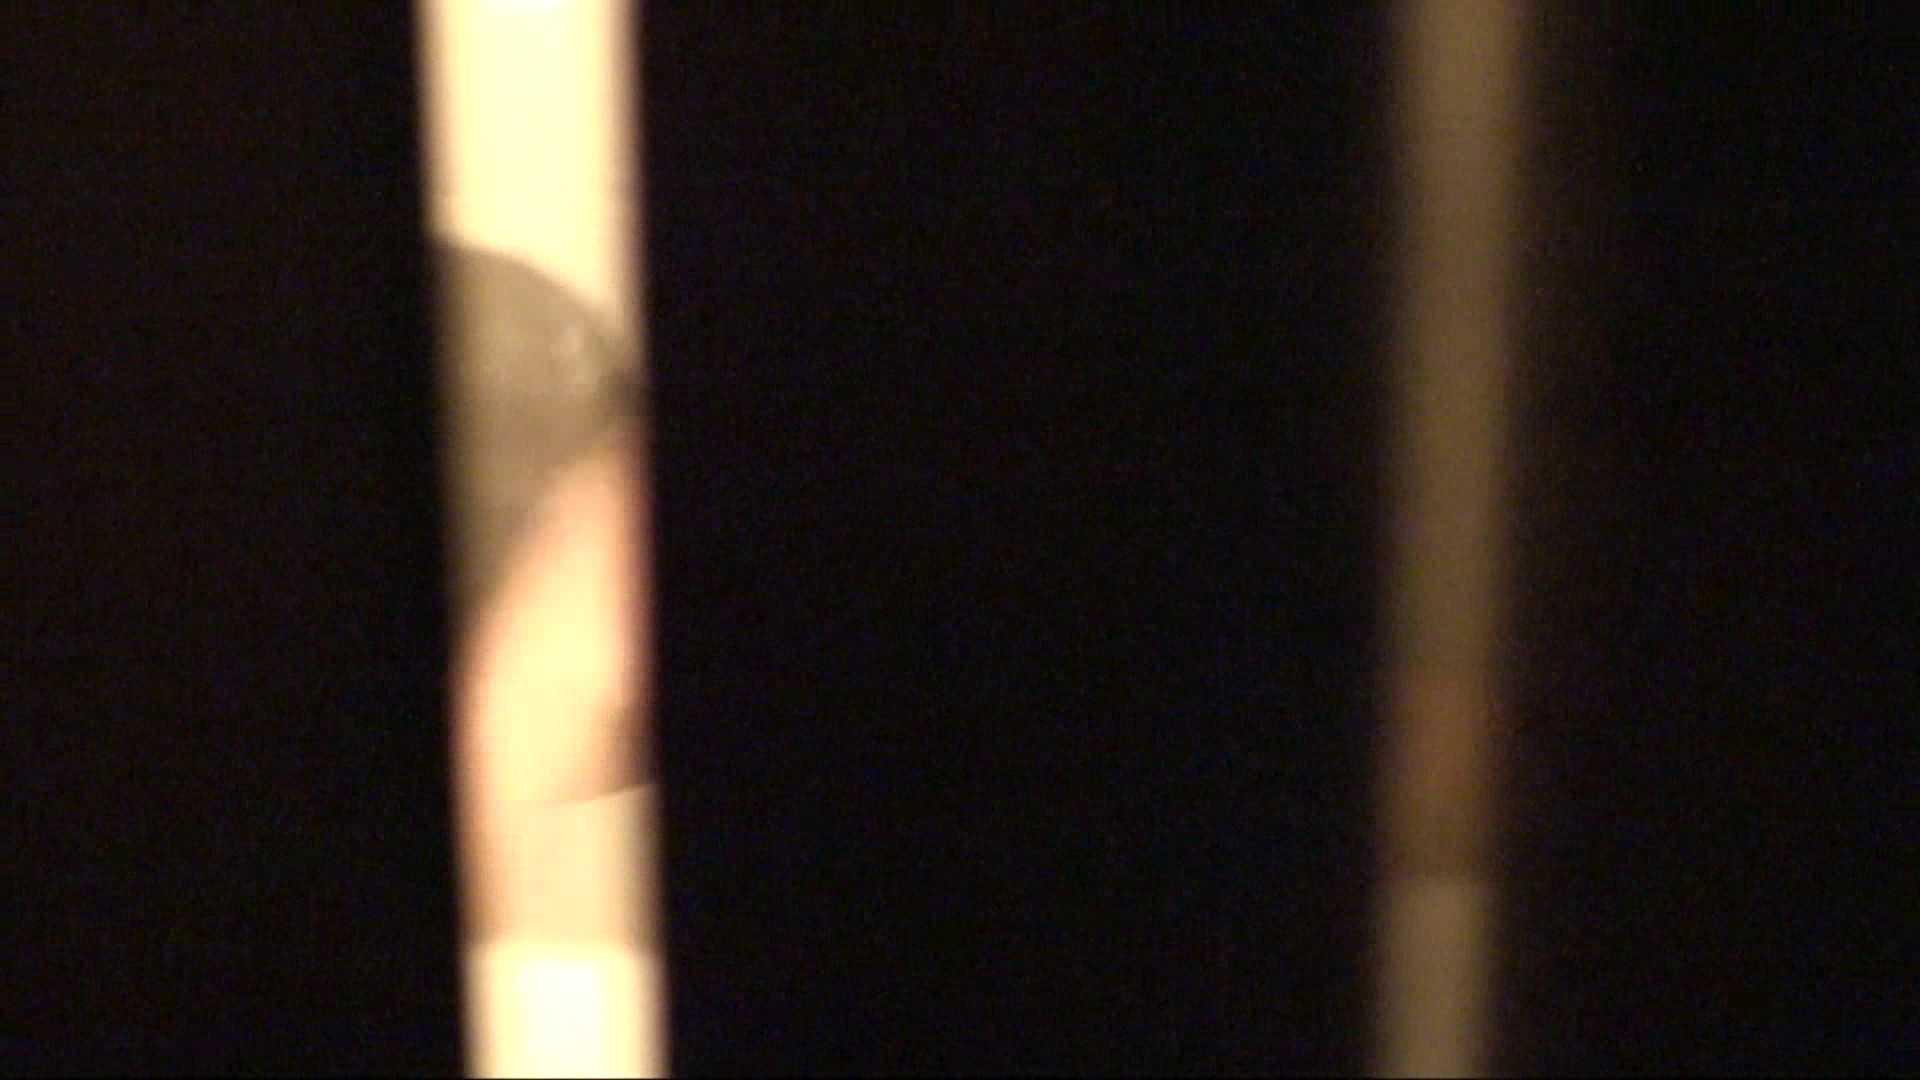 vol.02超可愛すぎる彼女の裸体をハイビジョンで!至近距離での眺め最高! 美人  78pic 36